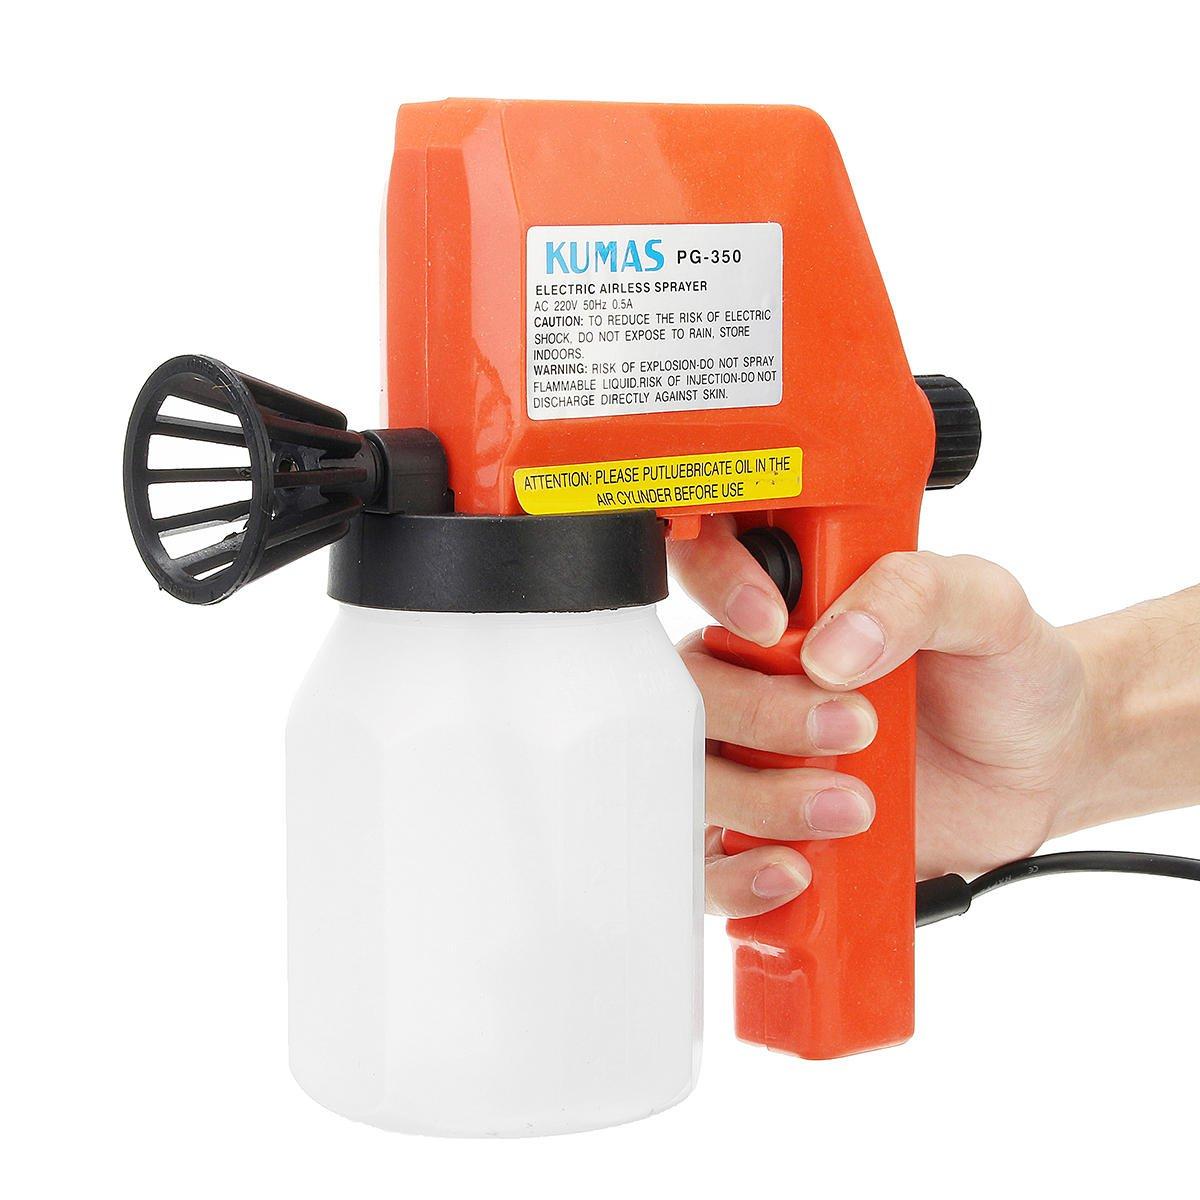 220V 75W 50Hz 600ml Electric Airless Spray DIY Paint Spray